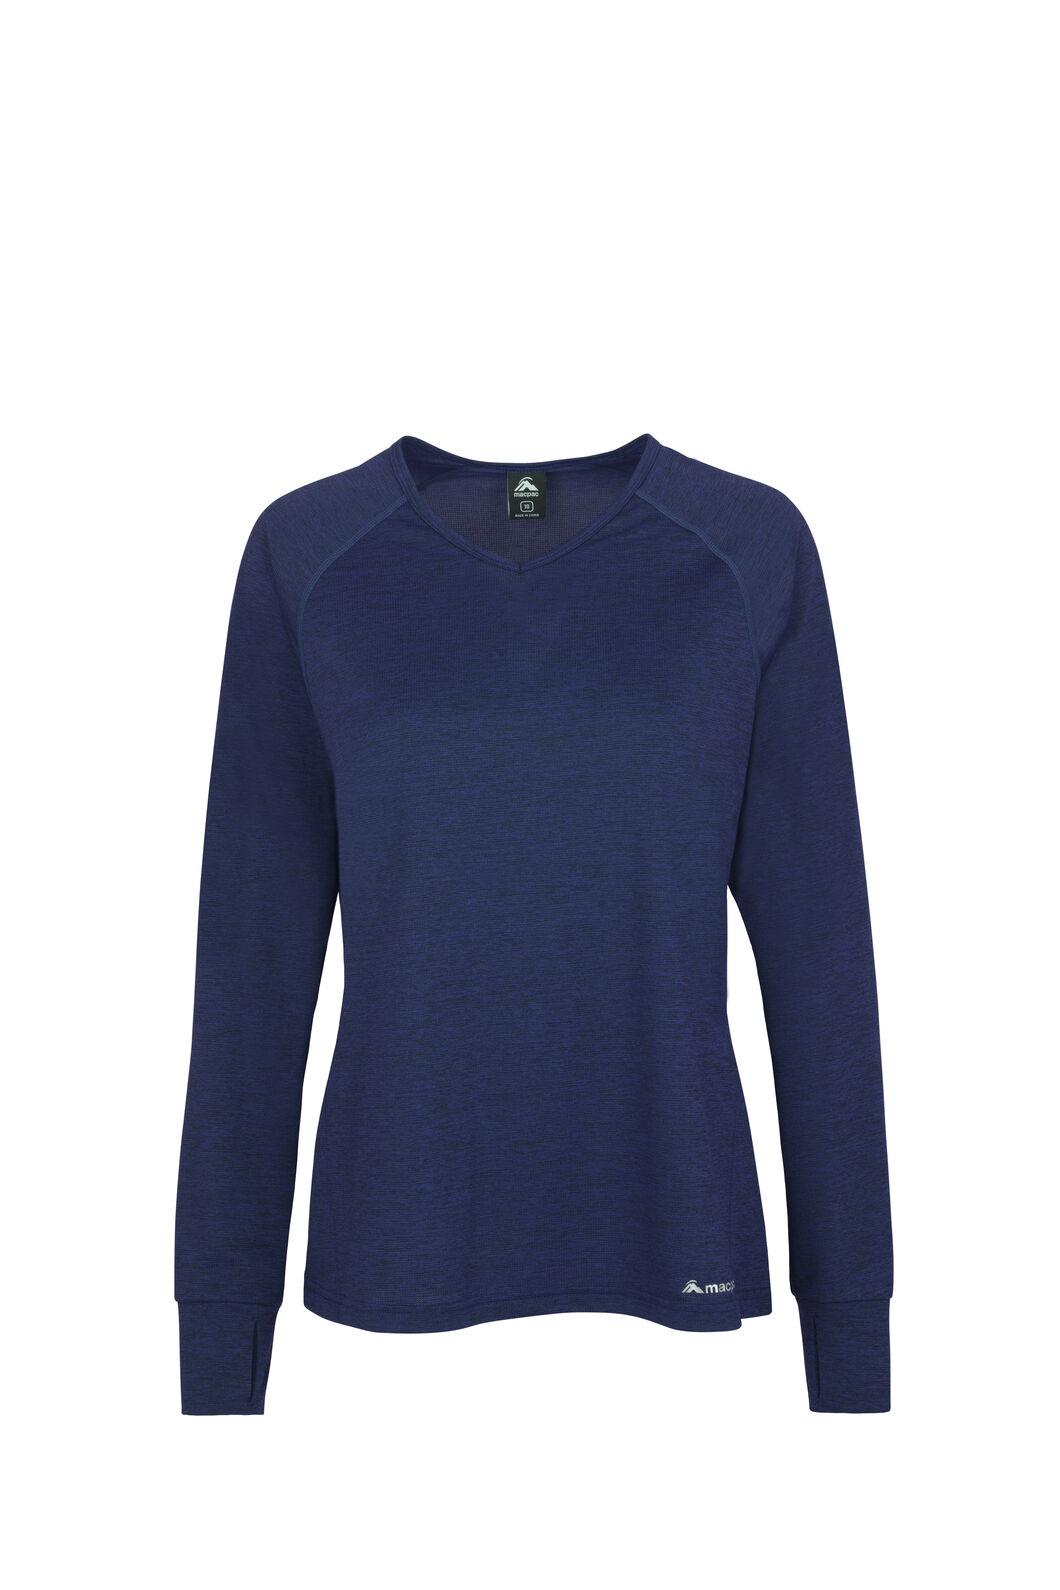 Macpac Take a Hike Long Sleeve Tee - Women's, Medieval Blue, hi-res